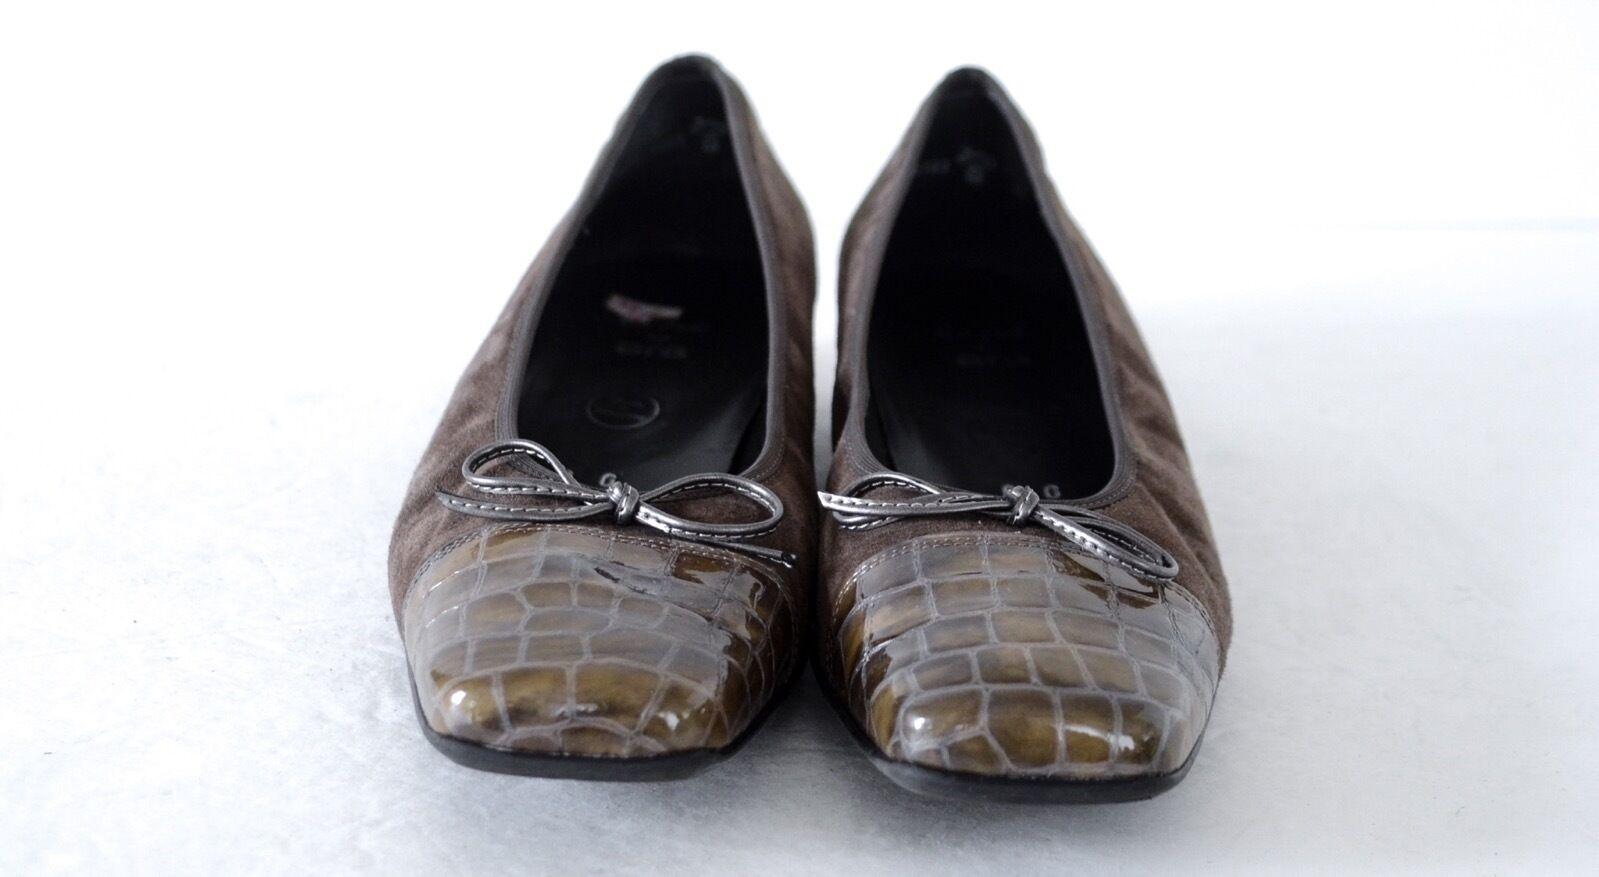 Rene By Ara Venezia Suede/Patent Olive Braun 6G/UK, Niedrig Heel Pumps Schuhes 6G/UK, Braun 8.5M 45085f